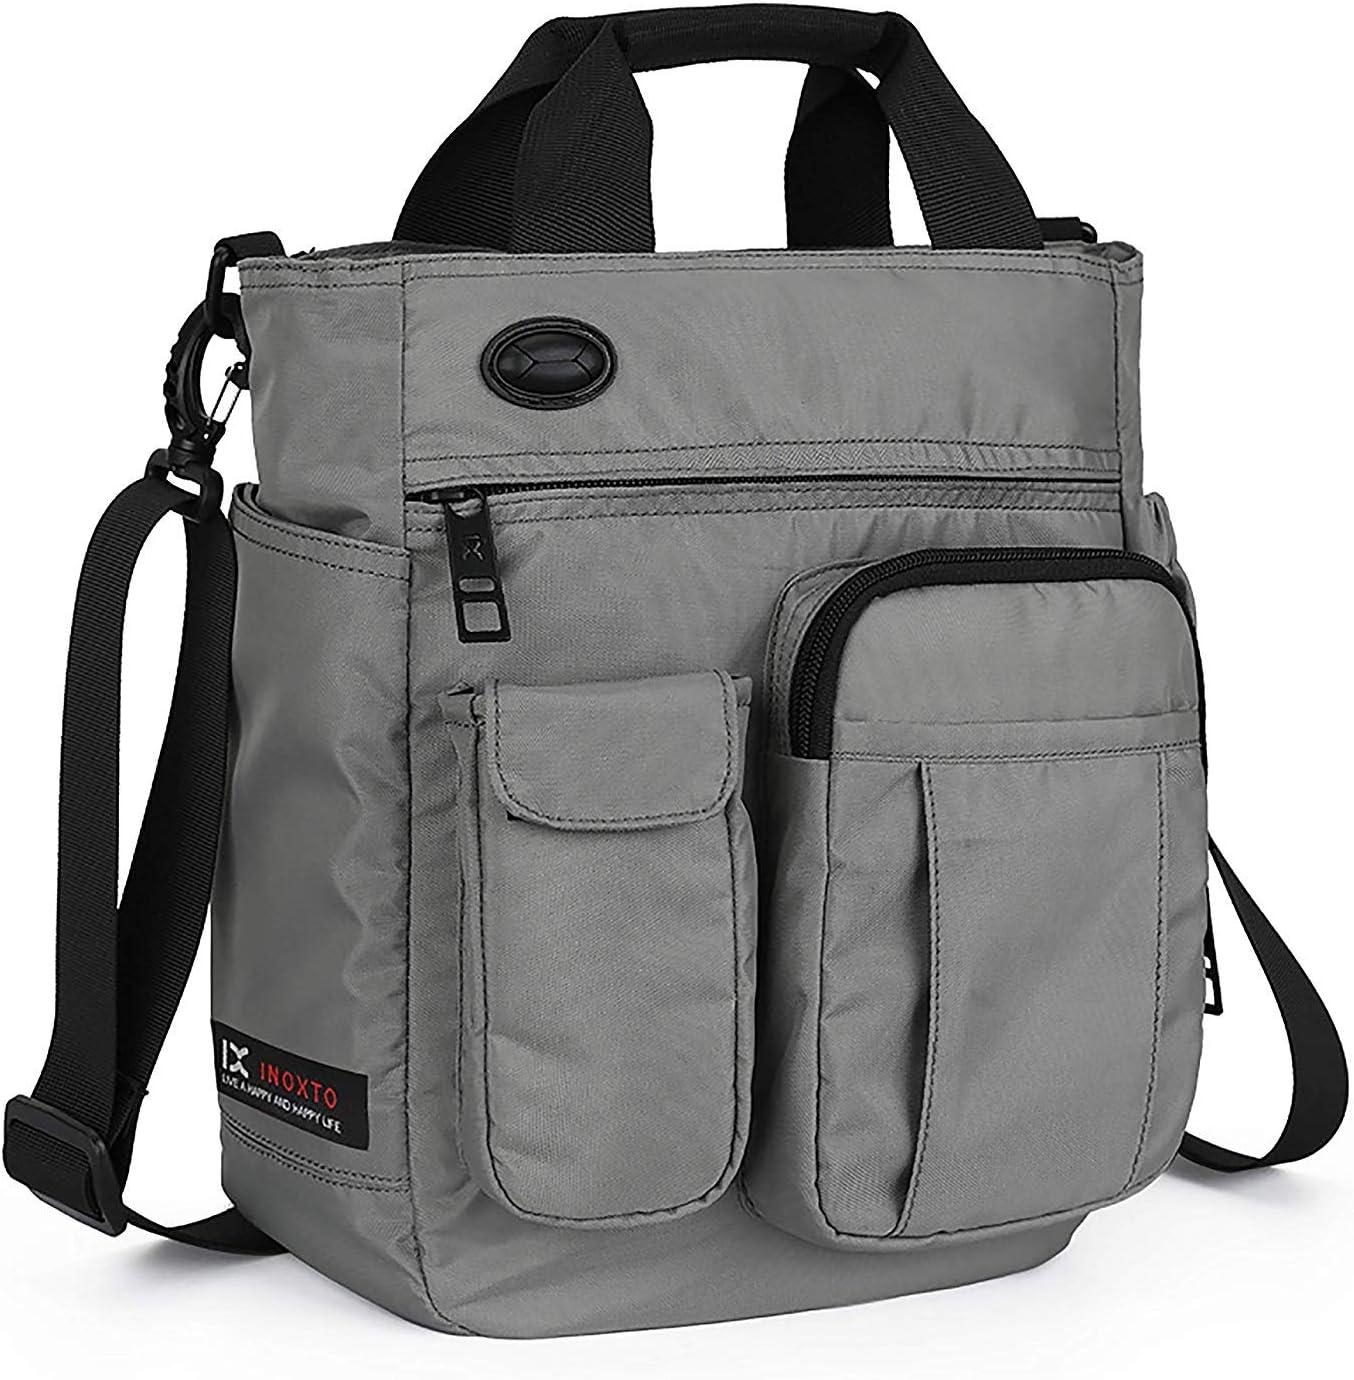 Crossbody Messenger Bag, Multifunctional Shoulder Bag, Laptop Bag for for Men and Women College School Business Sport Travel (Gray)